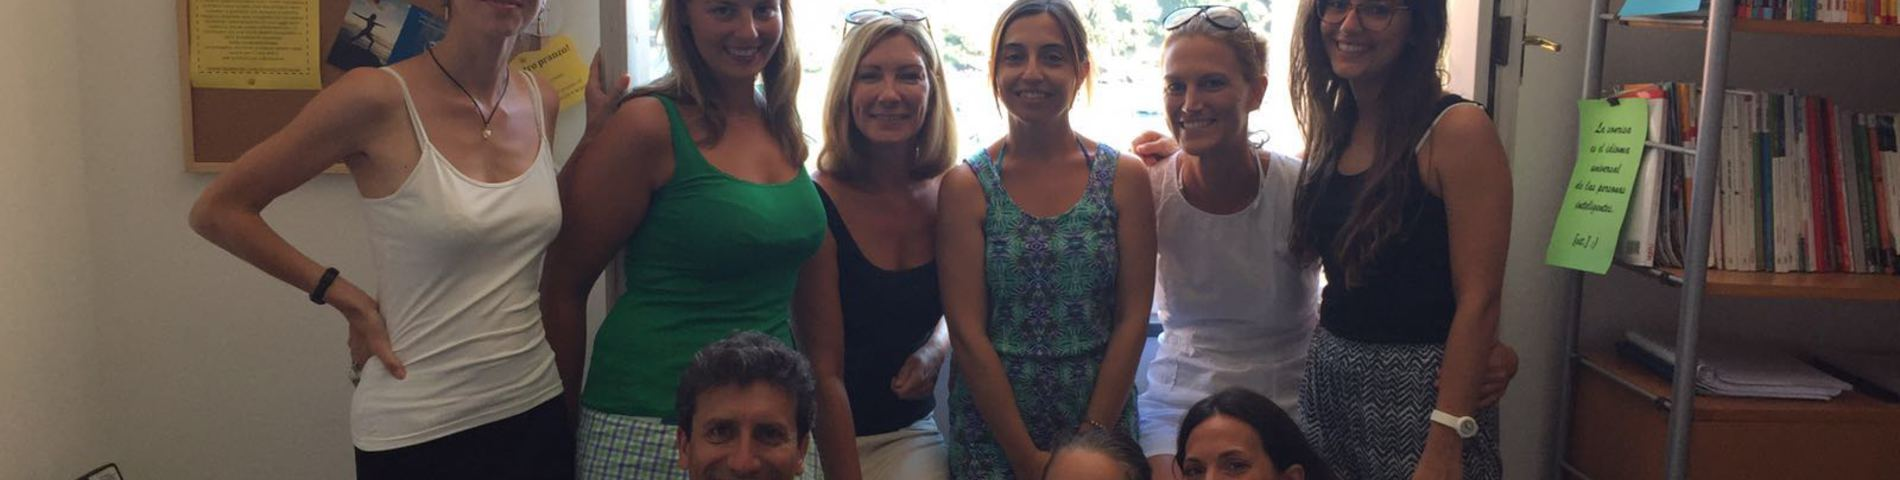 ABC Sestri Levante bild 1